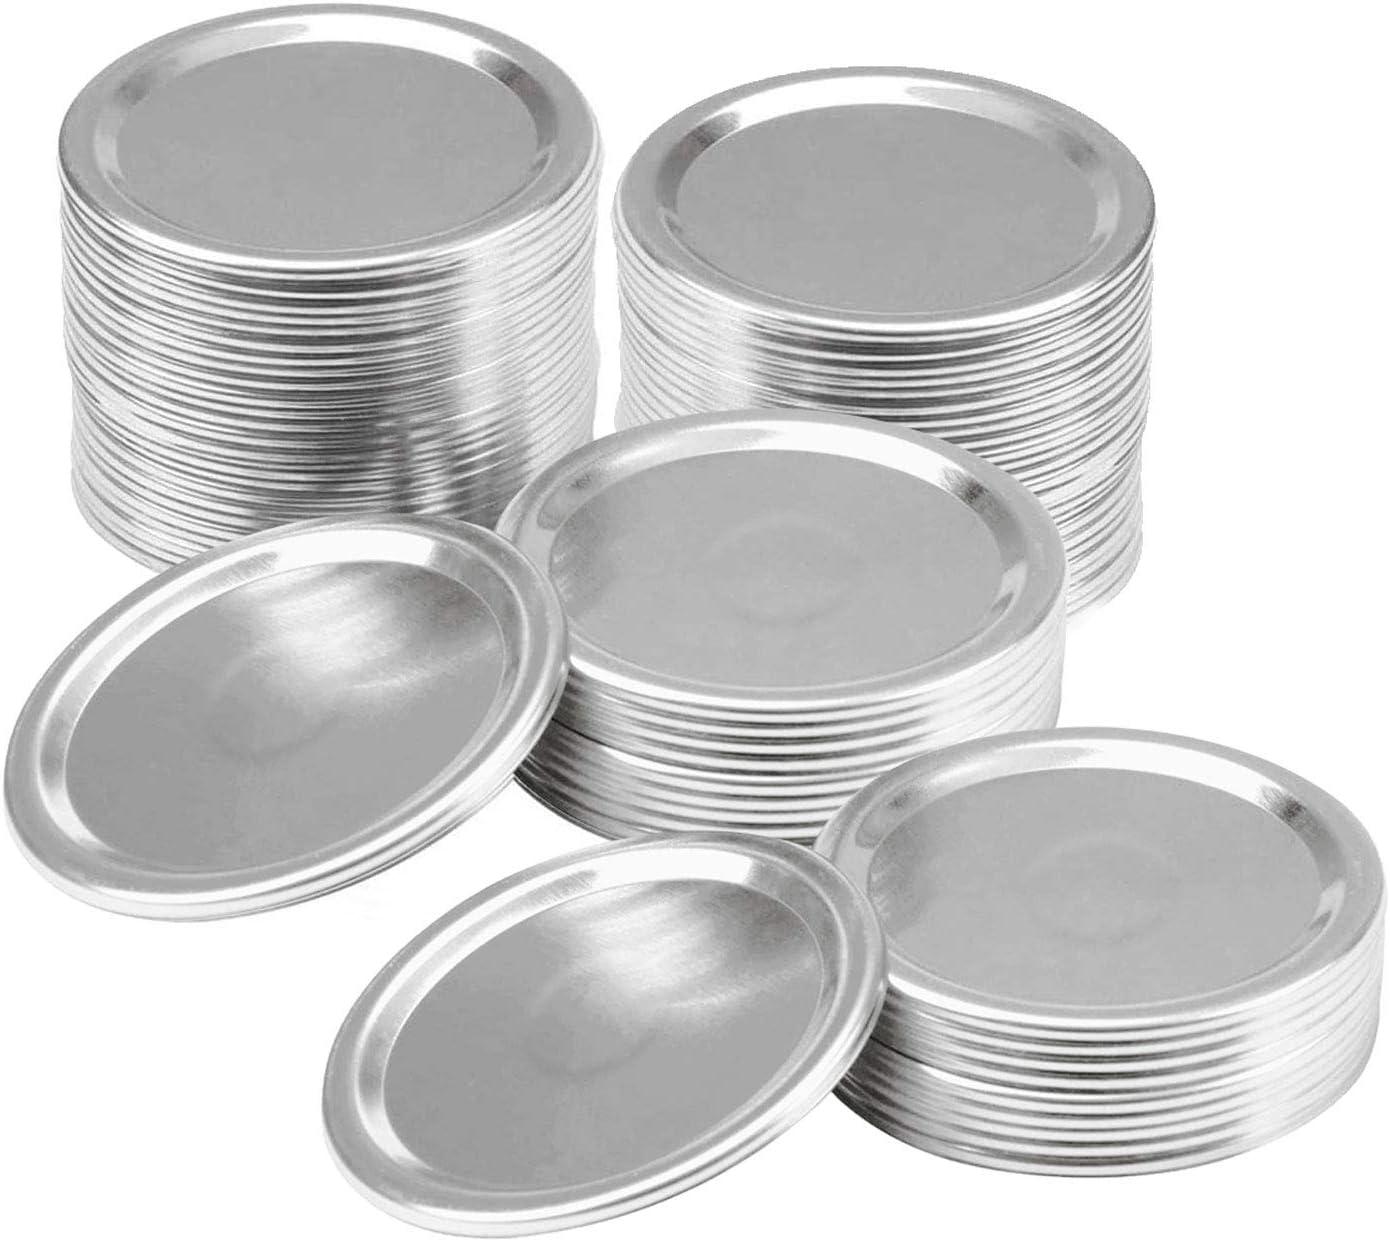 100 Pack Canning Lids Wide Mouth, Mason Jar Split-type Lids Leak Proof and Secure Canning Jar Caps, Metal Flat Sealing Storage Caps (86mm 100)